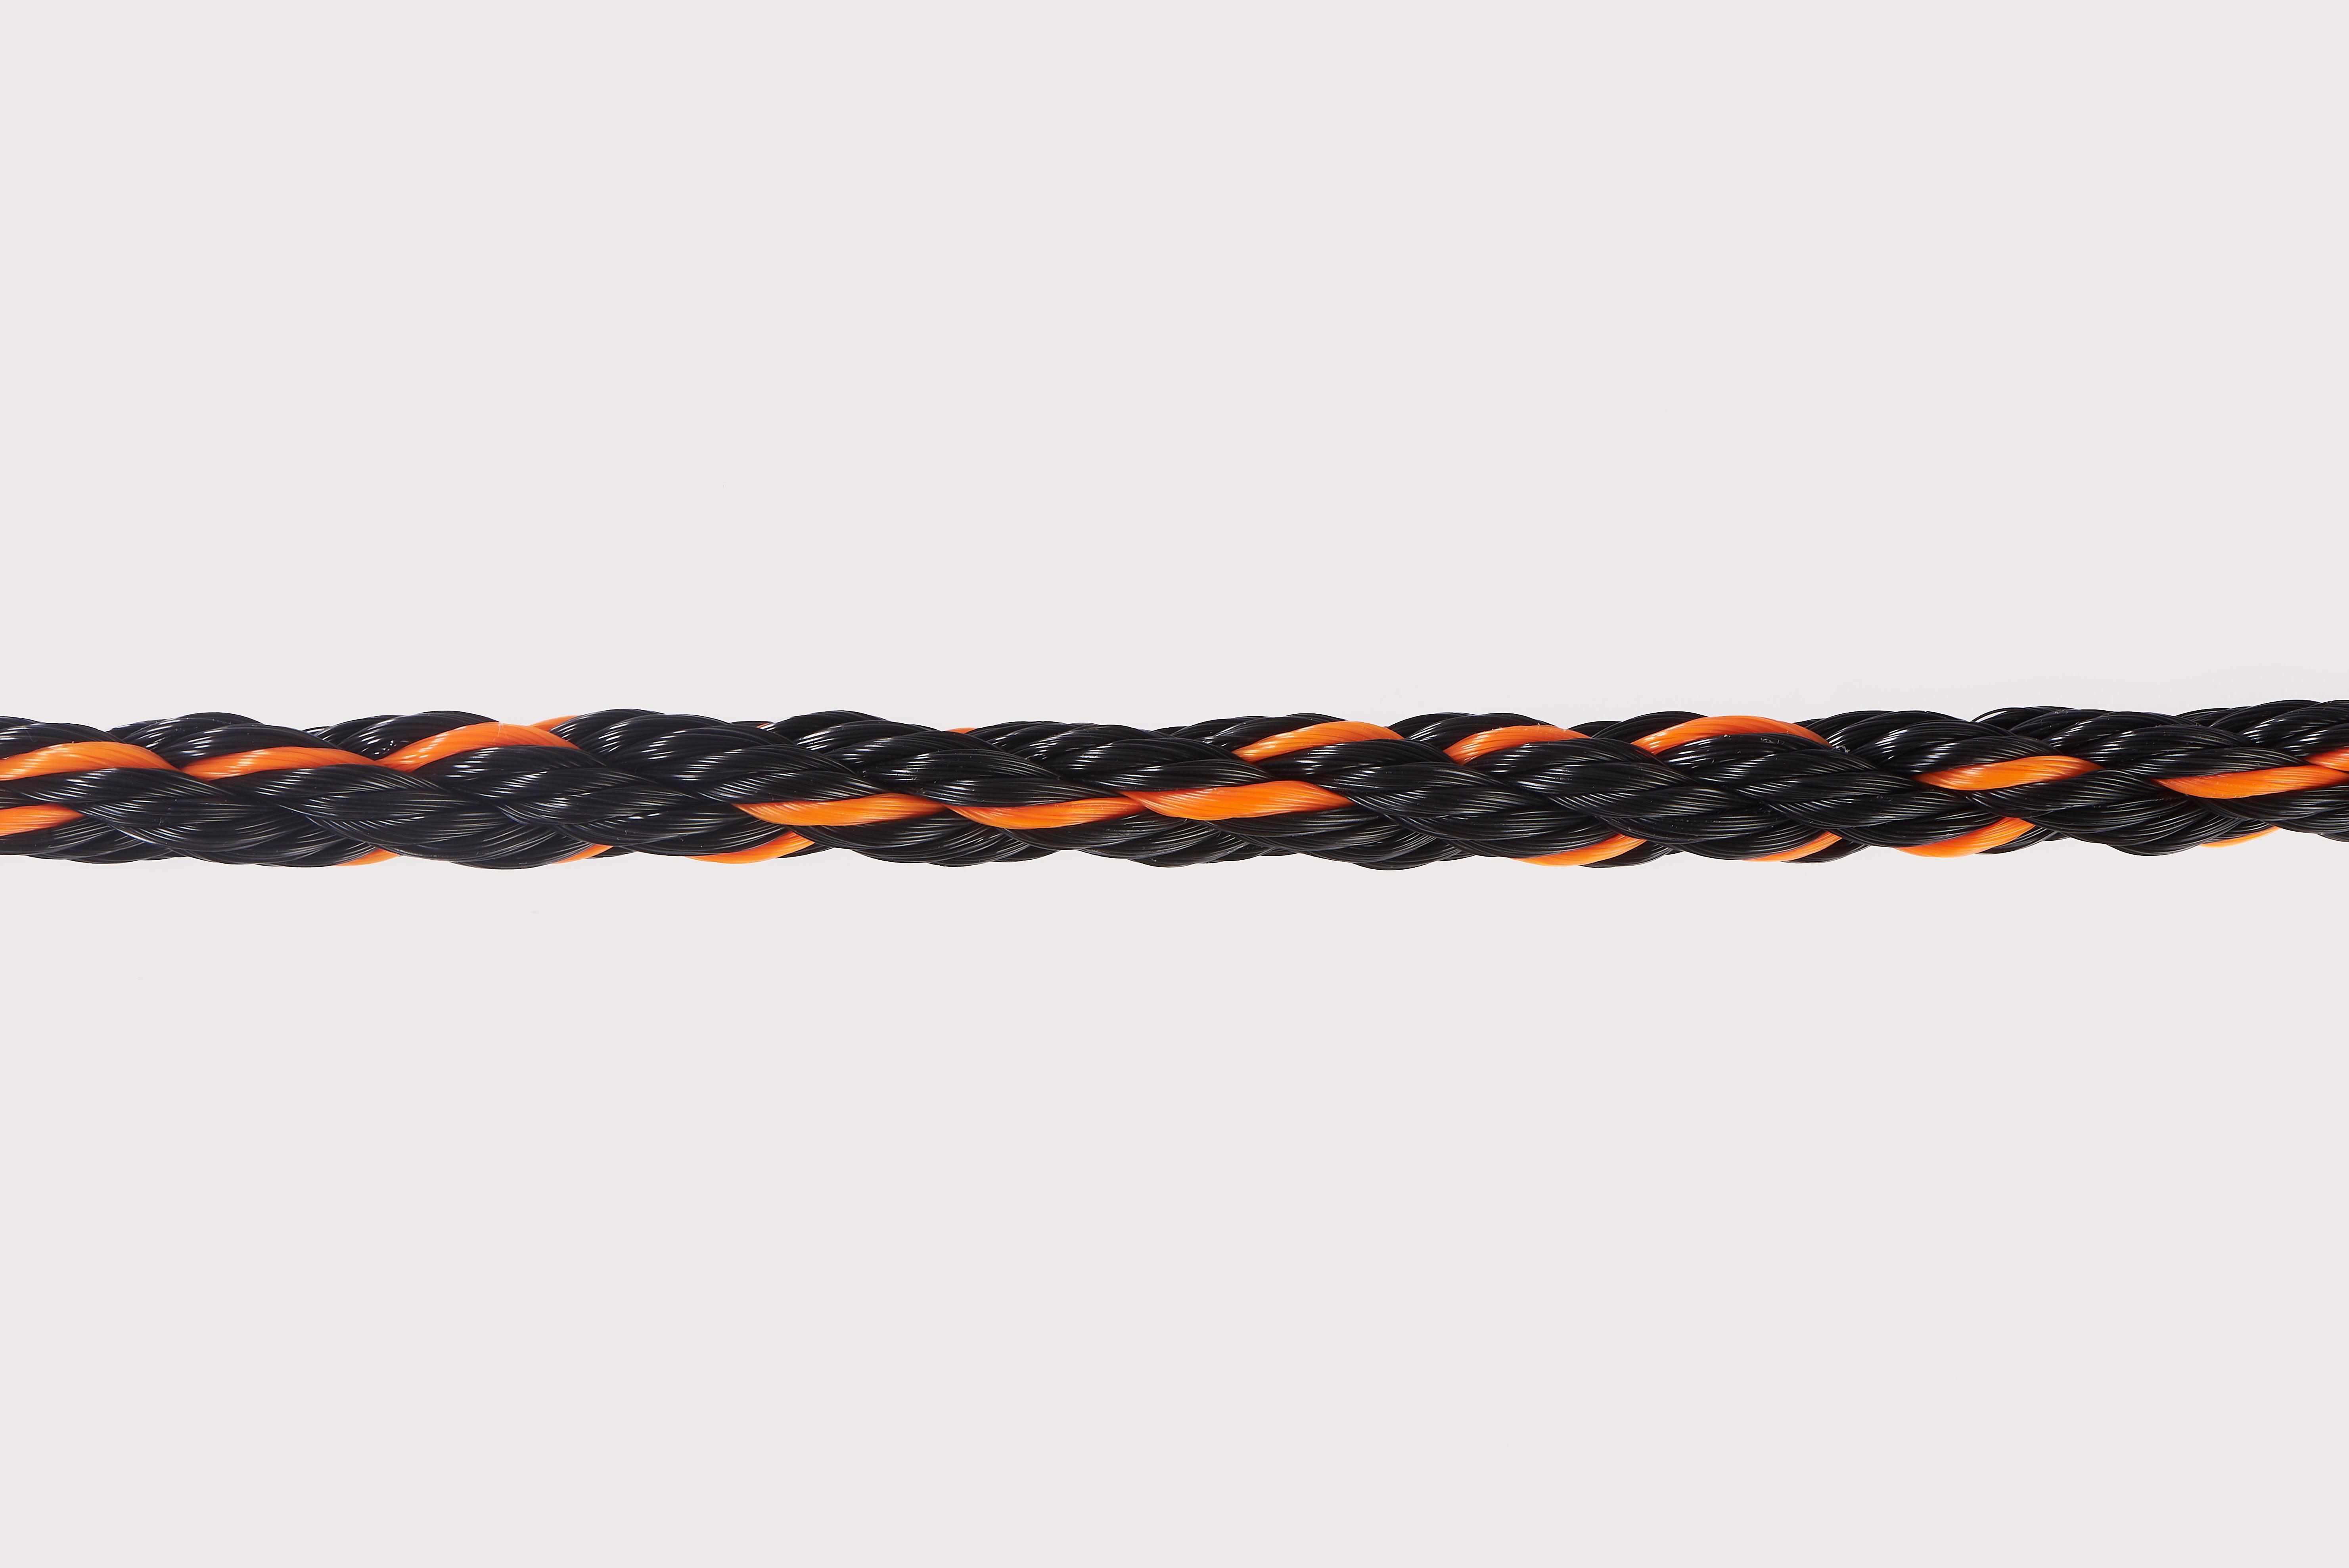 Orion-Cordage-Polylite 3-Strand Monofilament Polypropylene-Black I Orange-Horizontal152.jpg